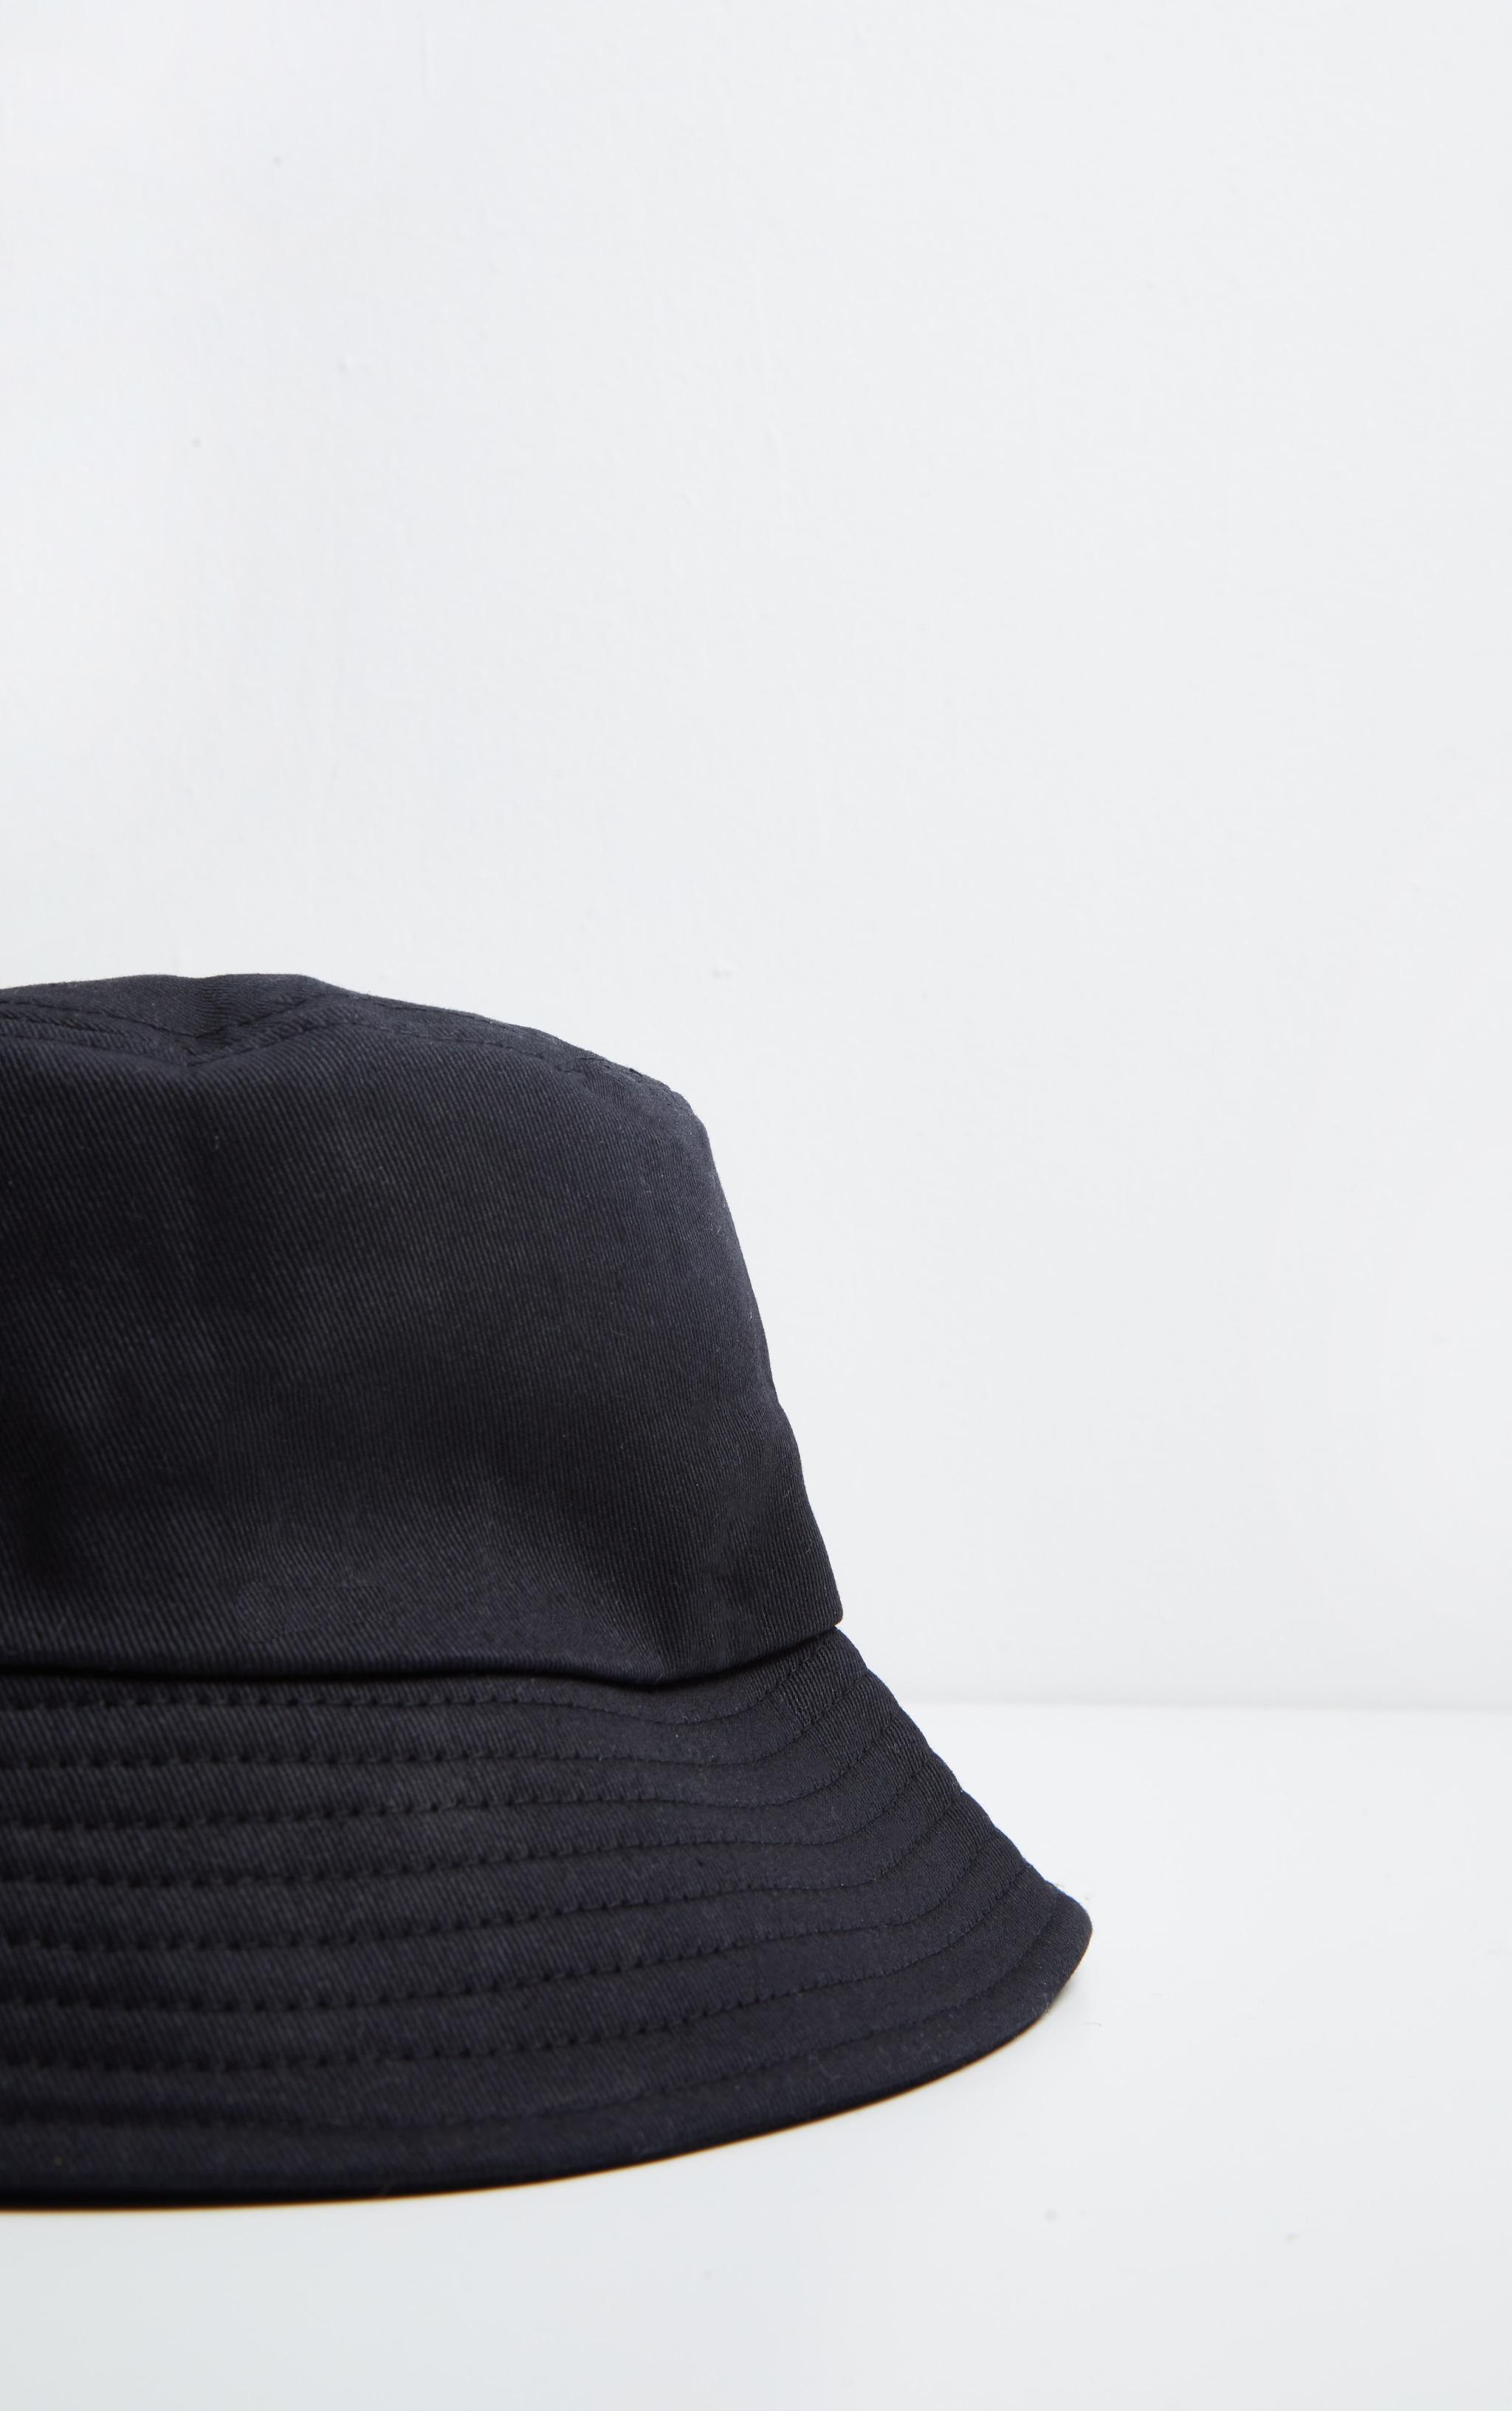 Plain Black Bucket Hat 3